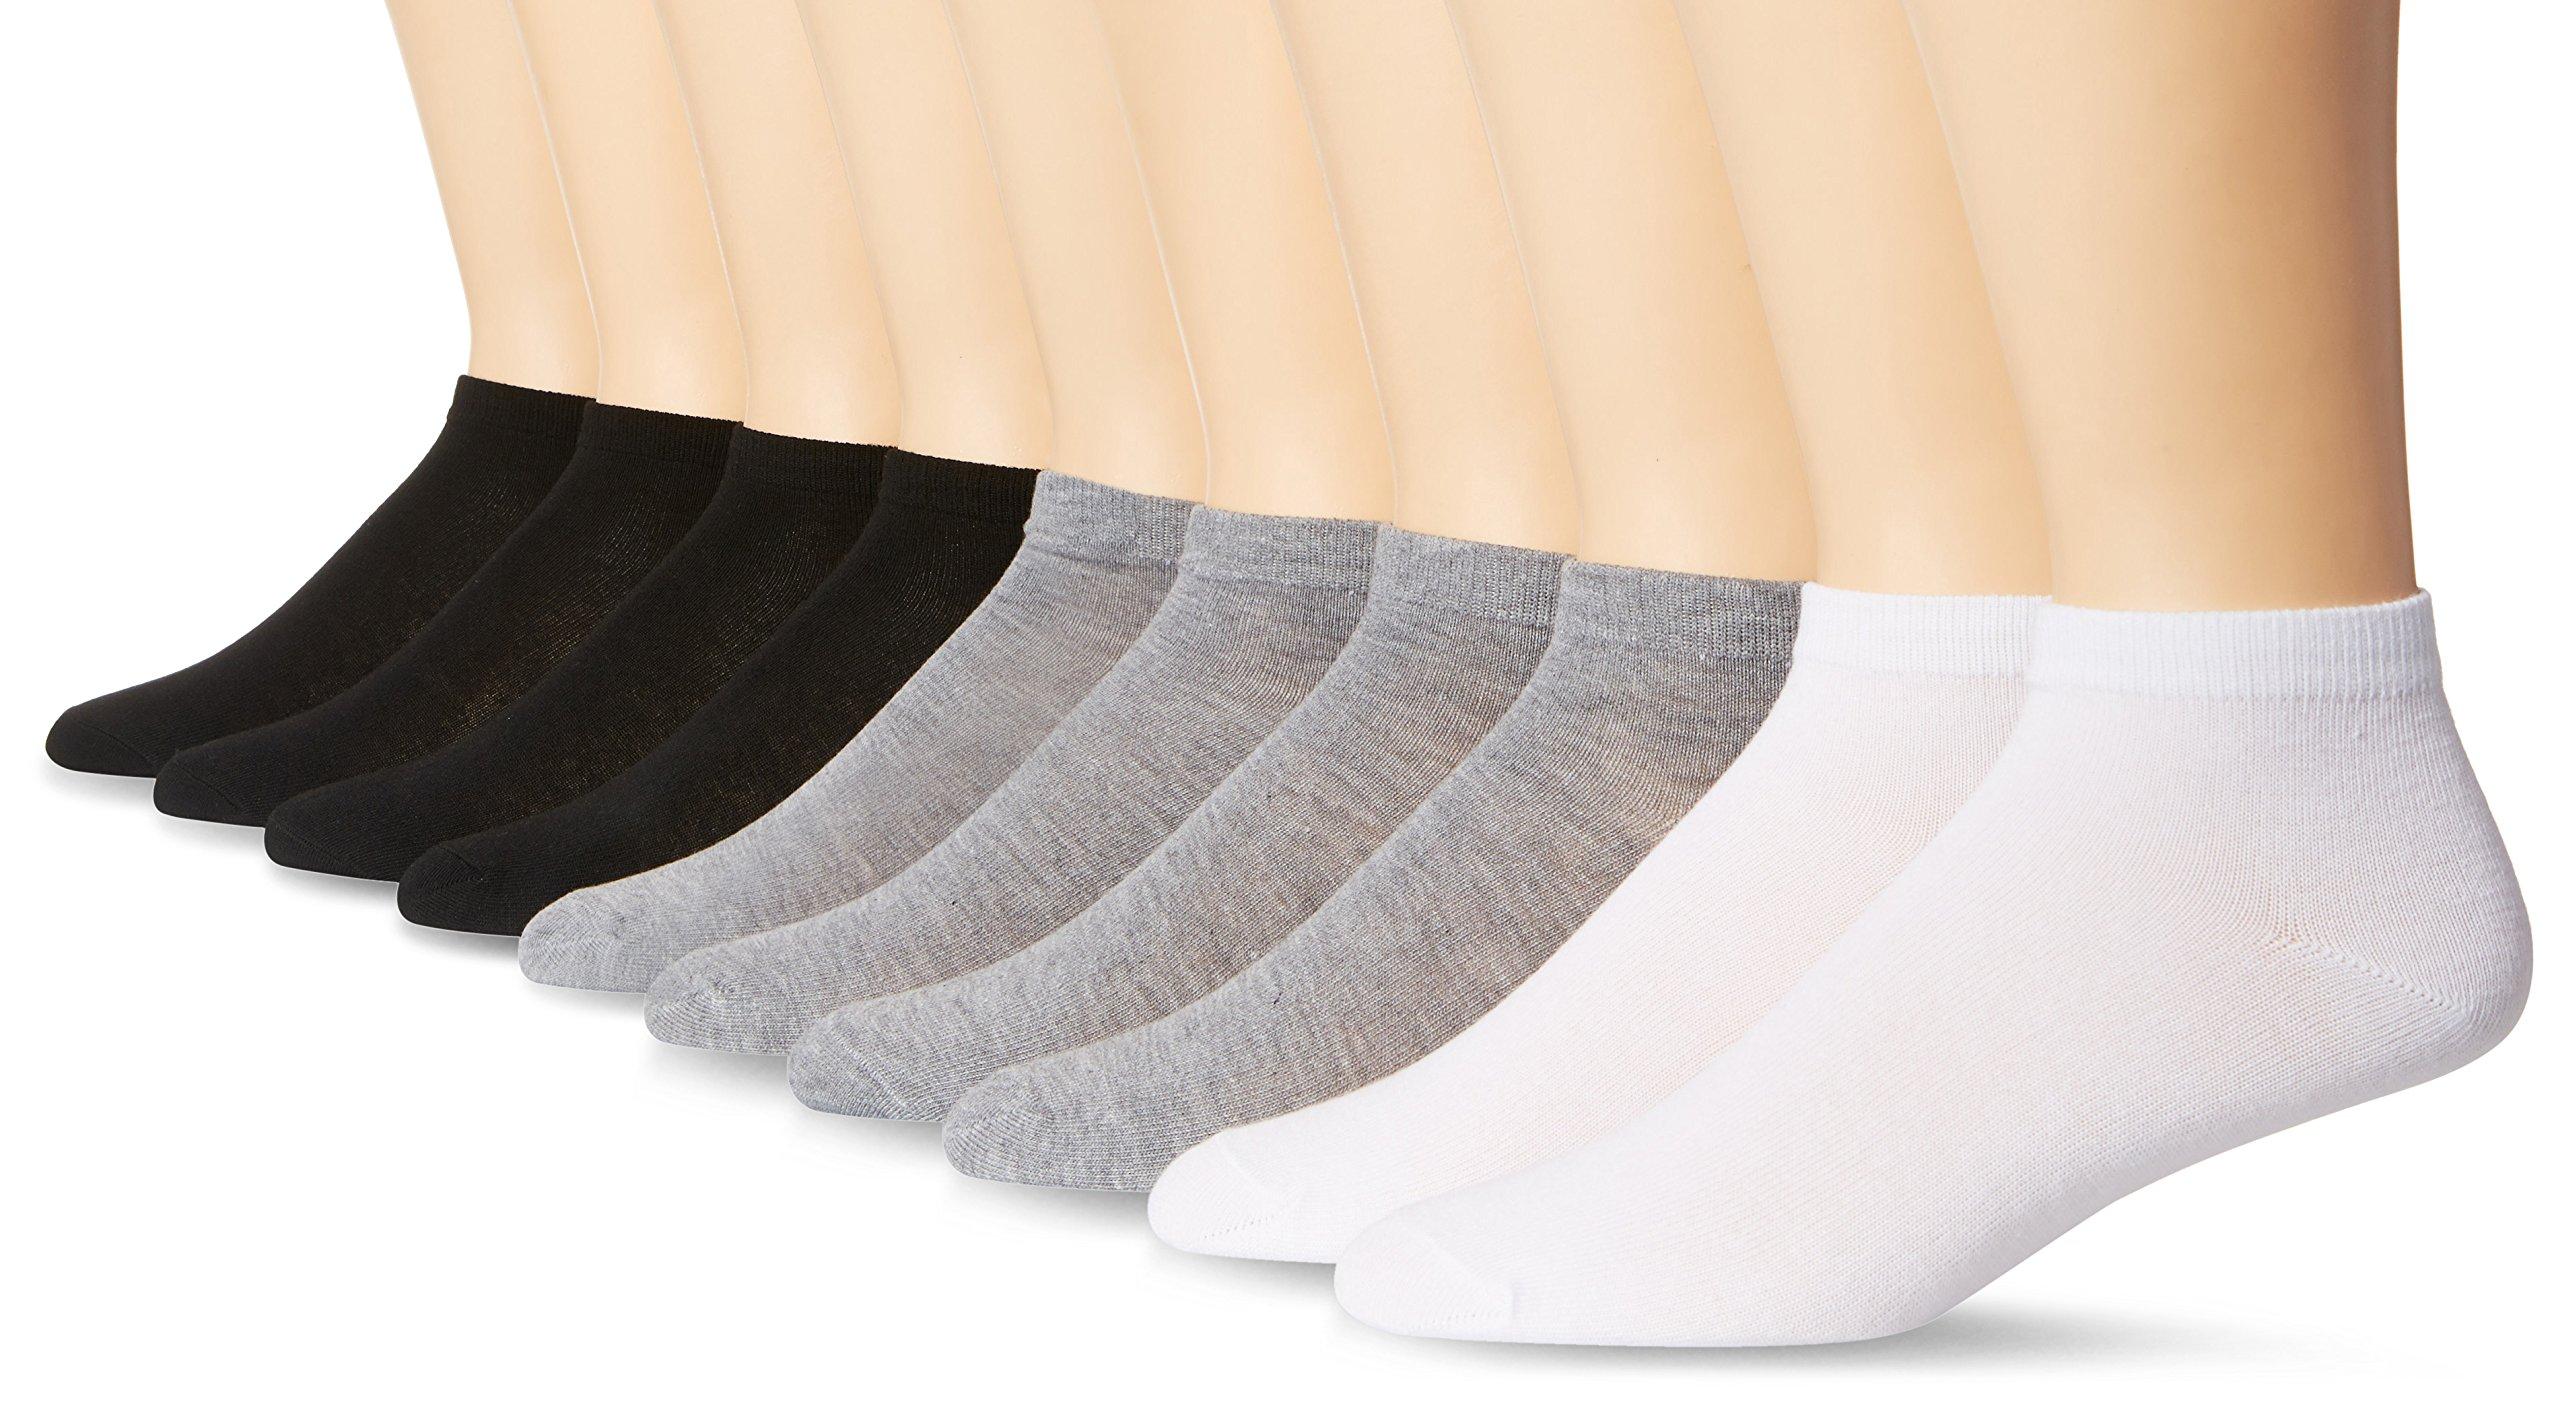 Signature Brands Men's 10 Pack Athletic Low Cut Sock, Black/Grey/White, Sock Size: 10-13/Shoe Size:9-11